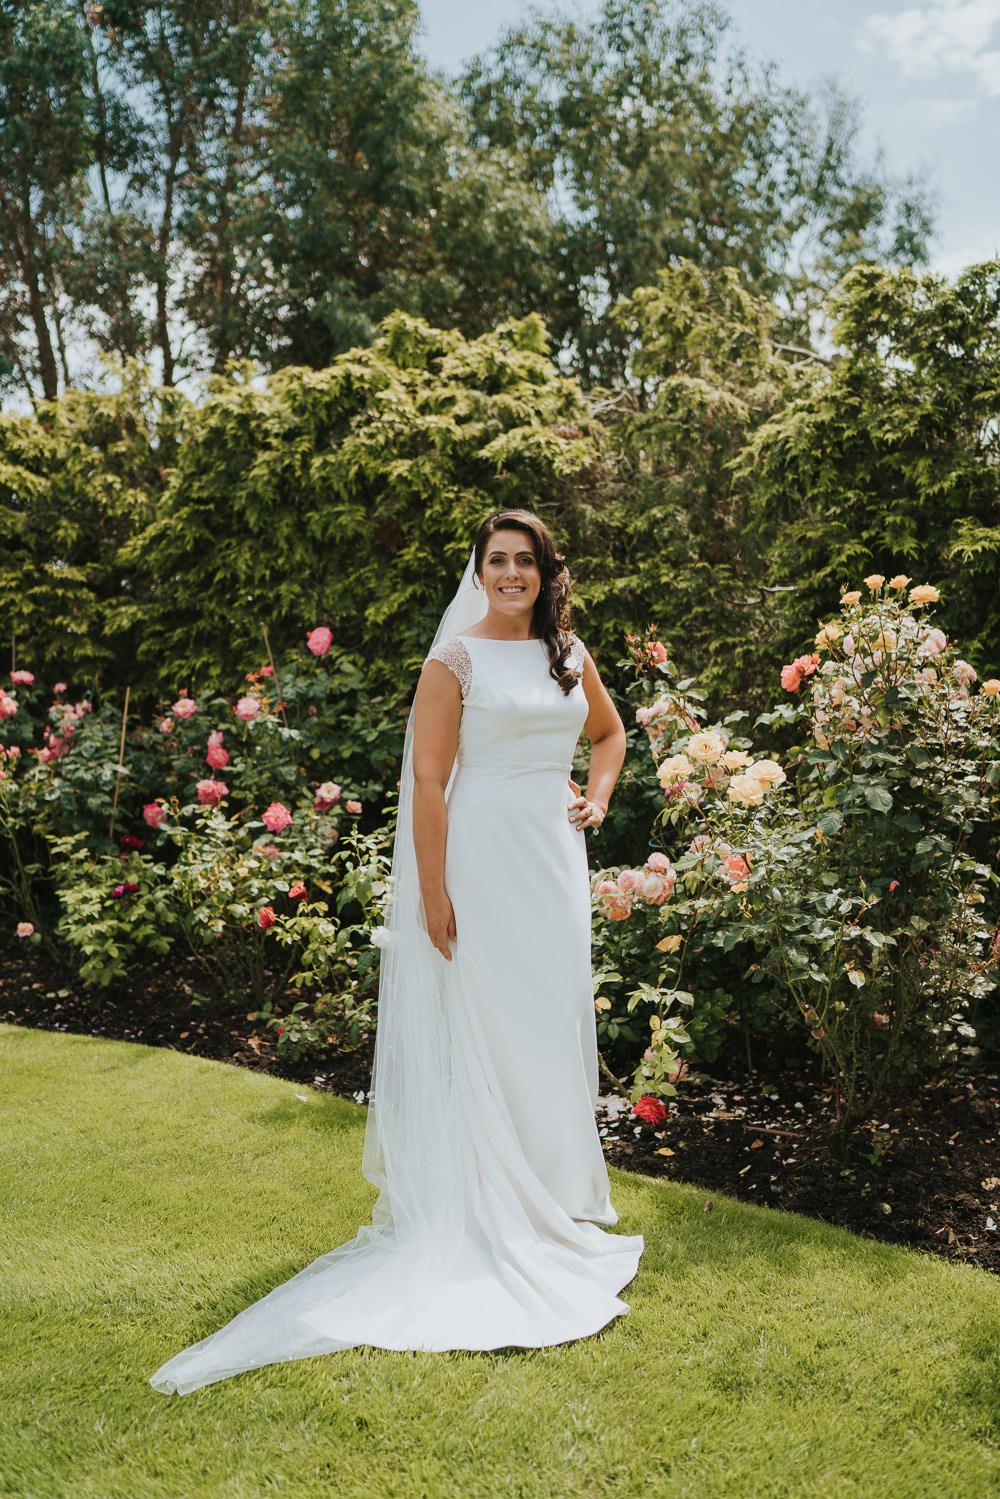 Bride Bridal Dress Gown Maggie Sottero Evangelina Cap Sleeves High House Weddings Grace Elizabeth Photography